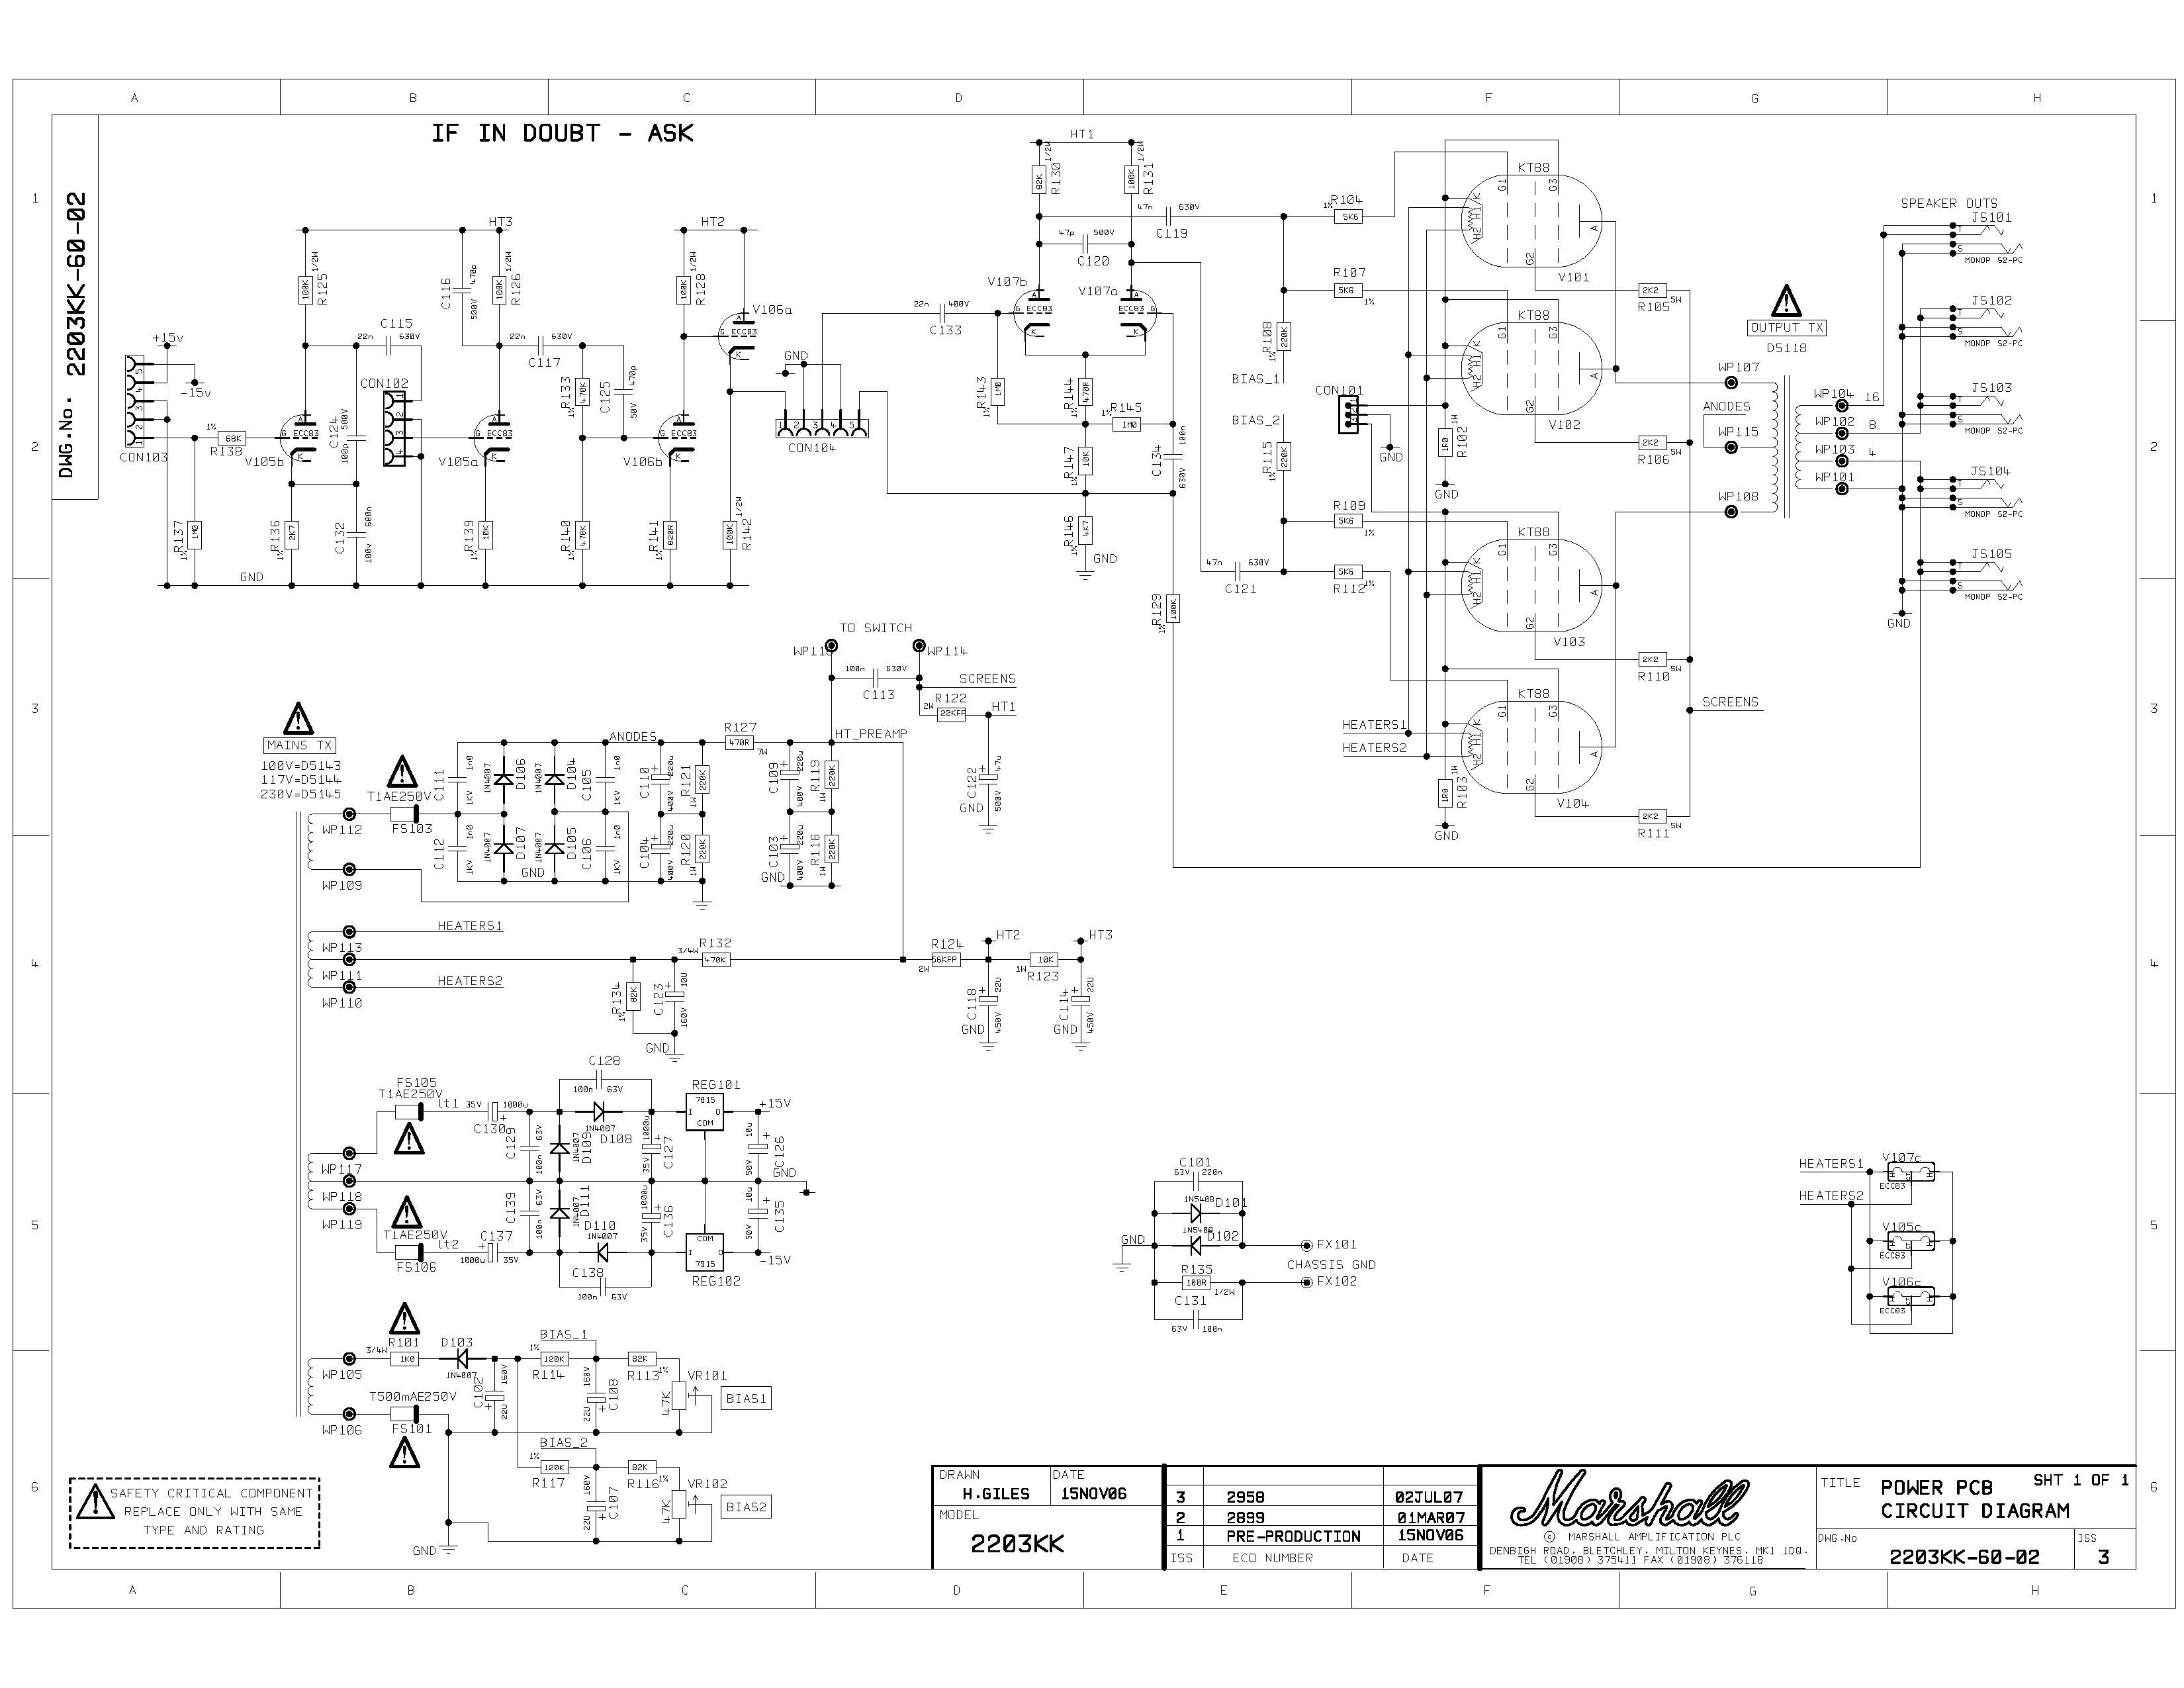 Jcm Schematic on jtm45 schematic, block diagram, technical drawing, dsl schematic, irig schematic, piping and instrumentation diagram, amp schematic, circuit diagram, guitar schematic, slo-100 schematic, jcm 900 schematic, marshall schematic, tube map, peavey schematic, fender schematic, one-line diagram, 1987x schematic, bass tube preamp schematic, functional flow block diagram, transformer schematic, overdrive schematic, 5e3 schematic, soldano schematic, ac30 schematic, 3pdt schematic, bassman schematic, zvex sho schematic,